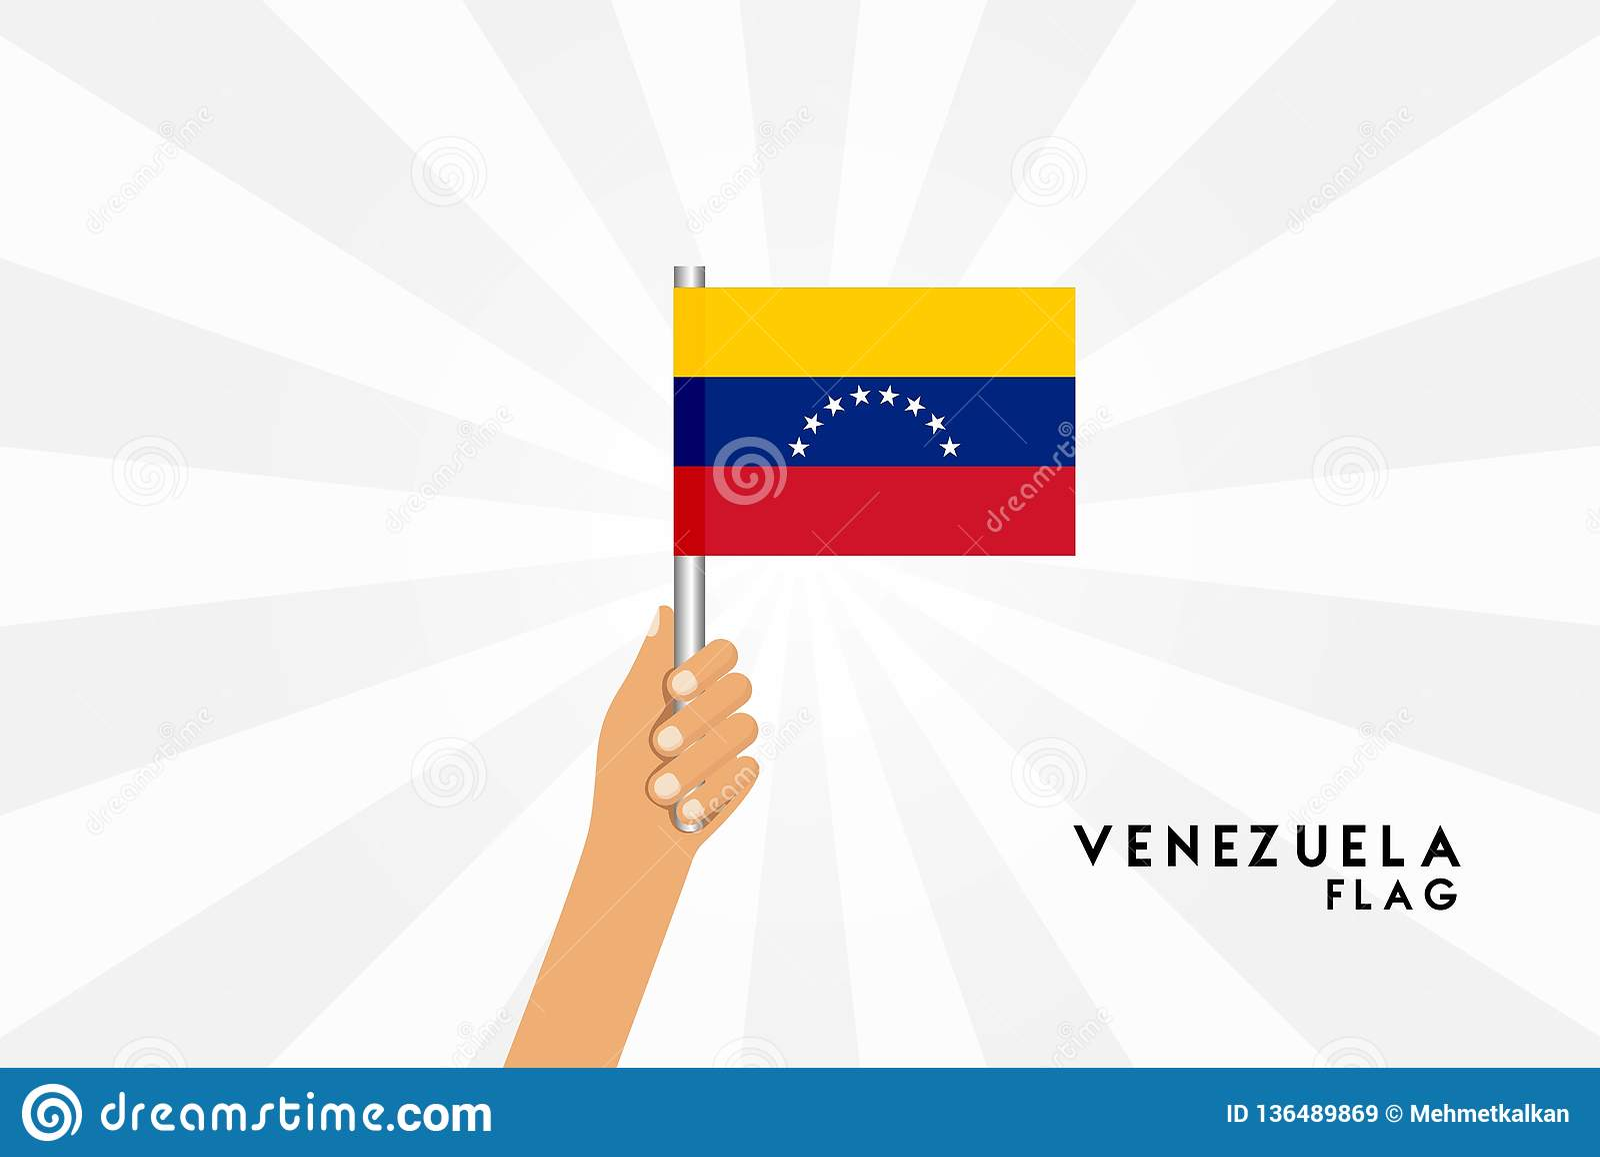 Vector cartoon illustration of human hands hold Venezuela flag